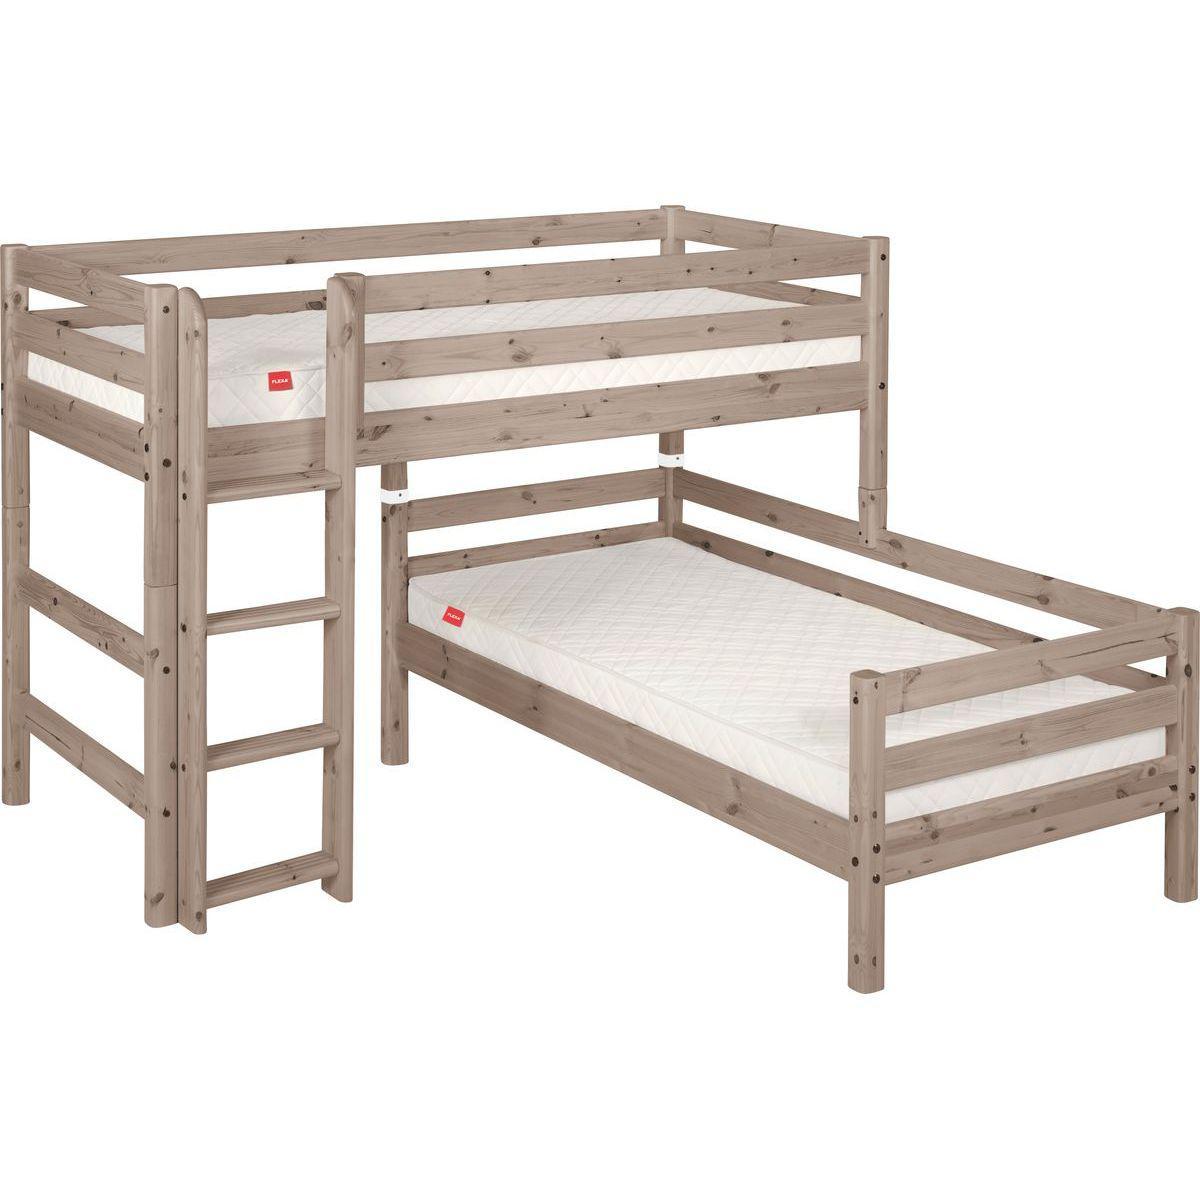 Halbhohes Bett + Einzelbett 90x200 cm + gerade Leiter CLASSIC by Flexa terra